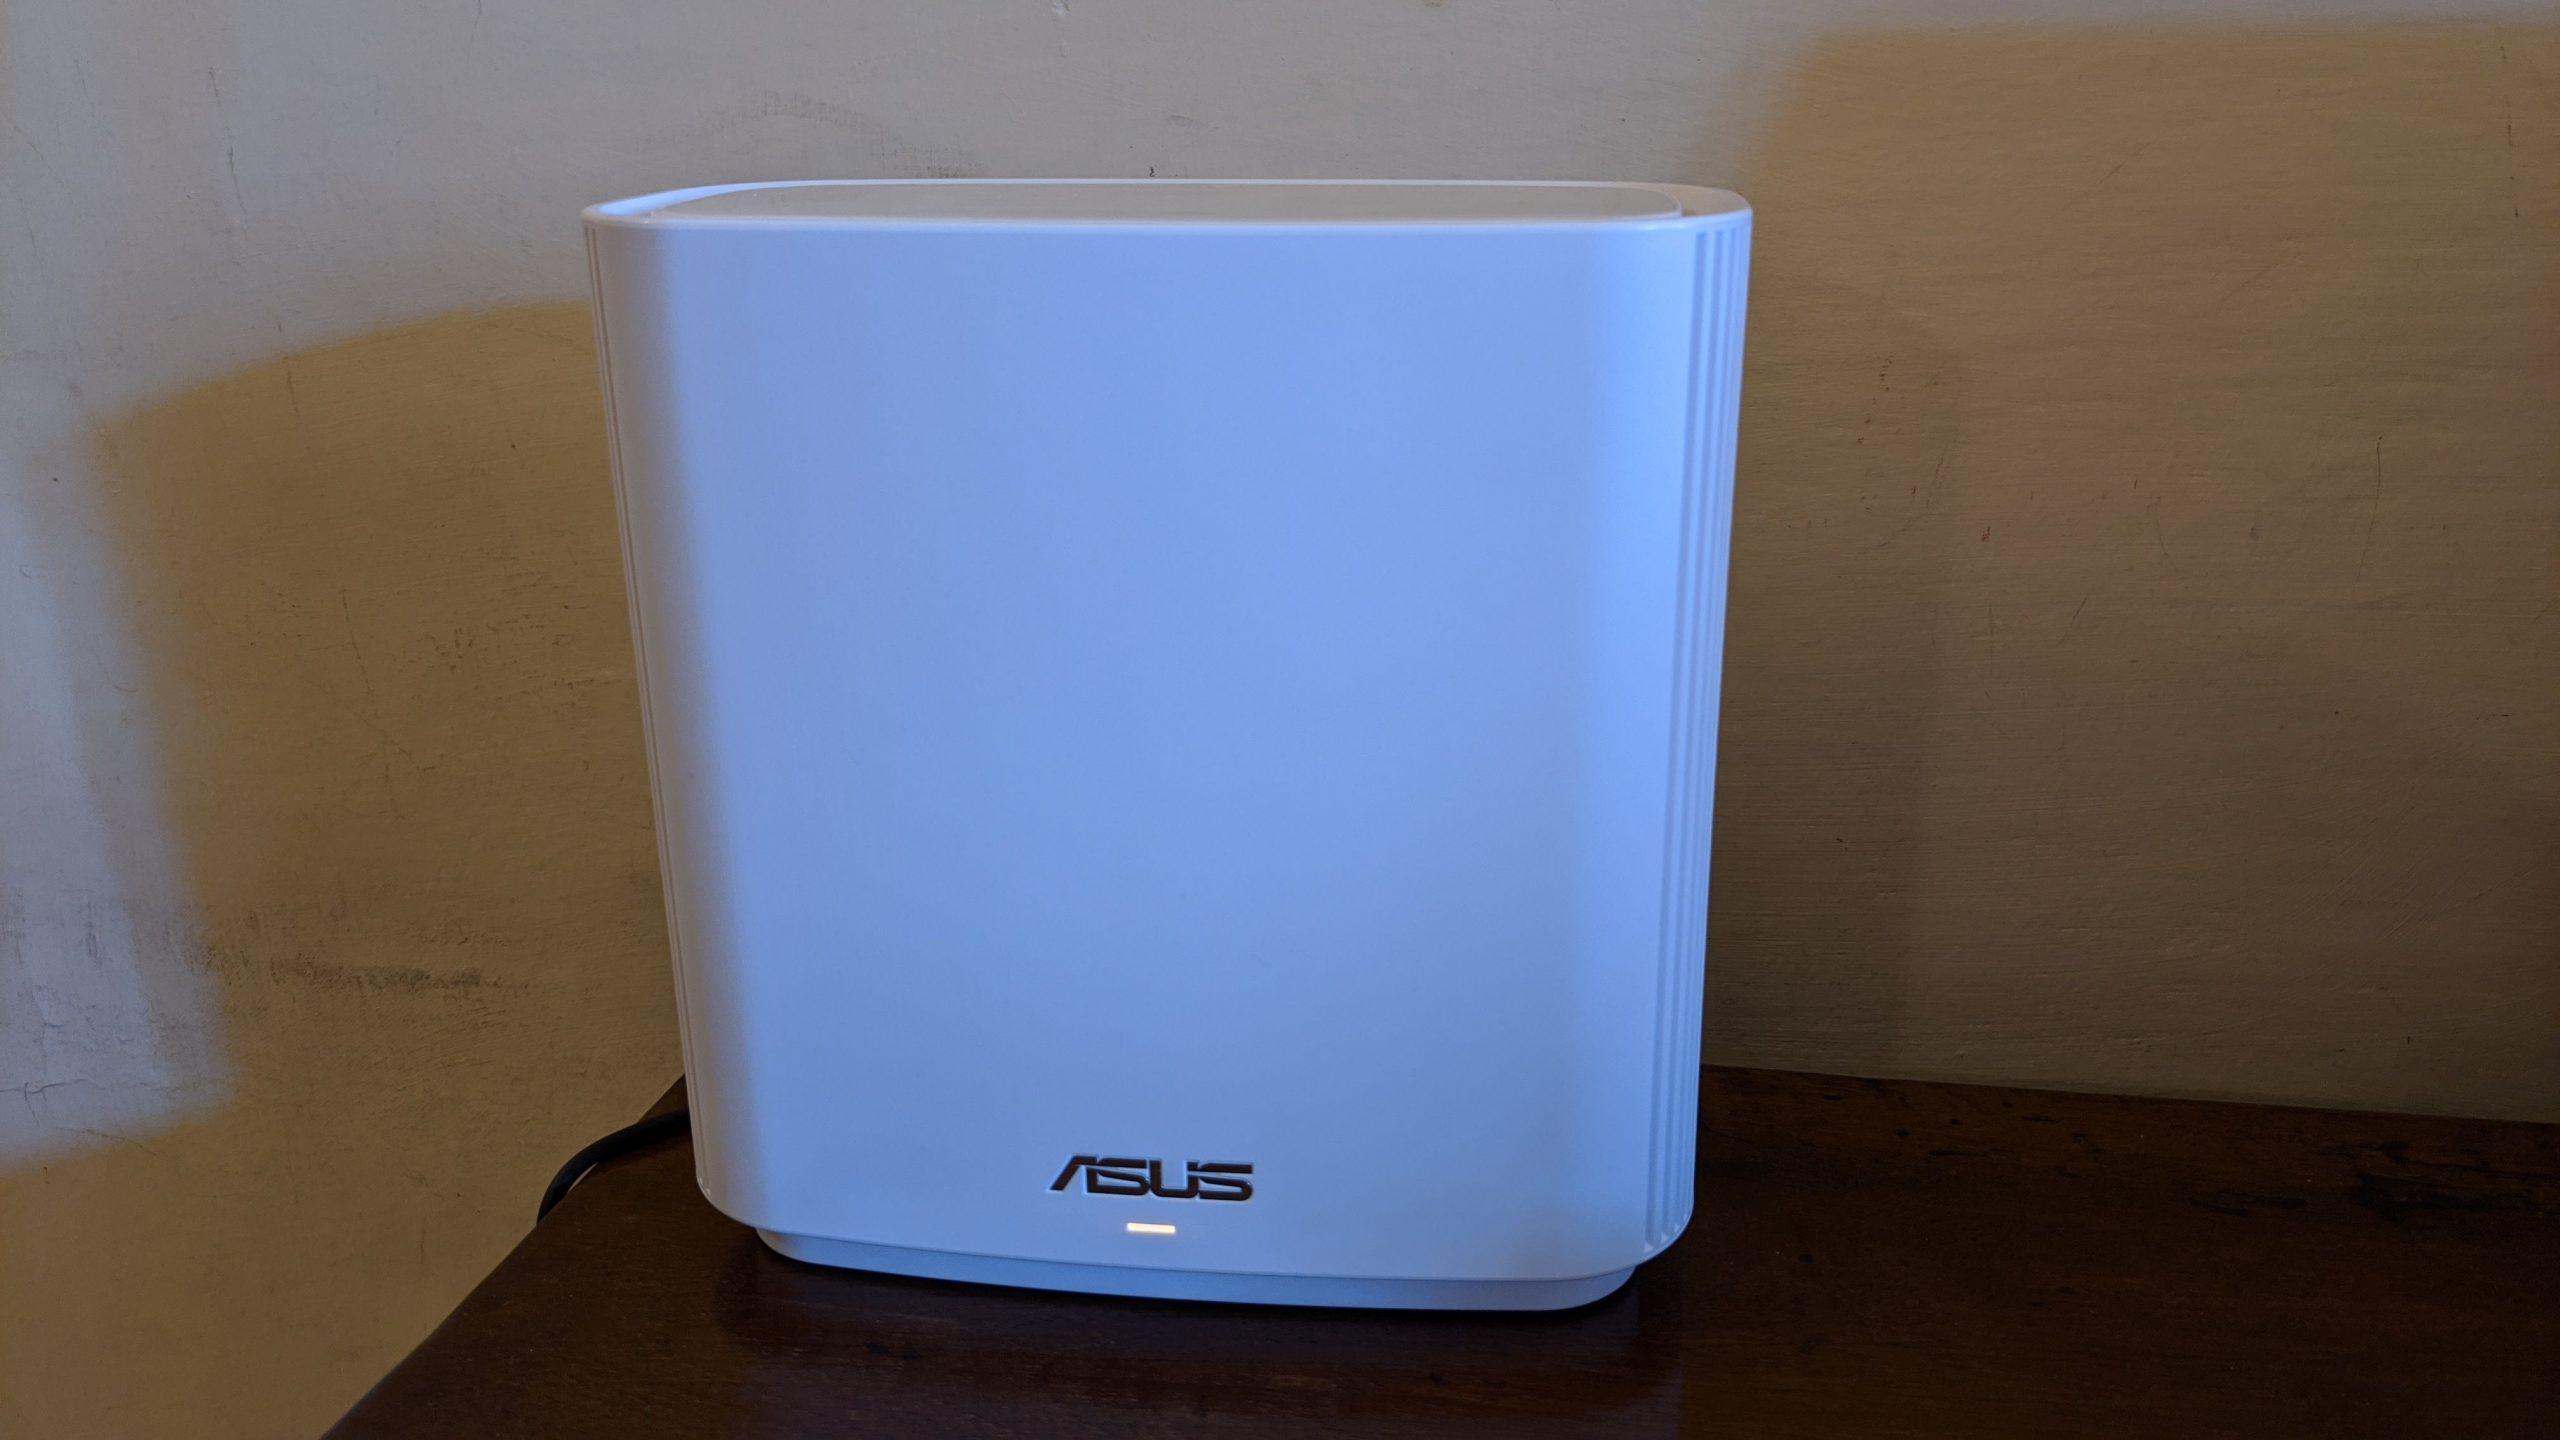 ASUS ZenWiFi AC3000 (CT8